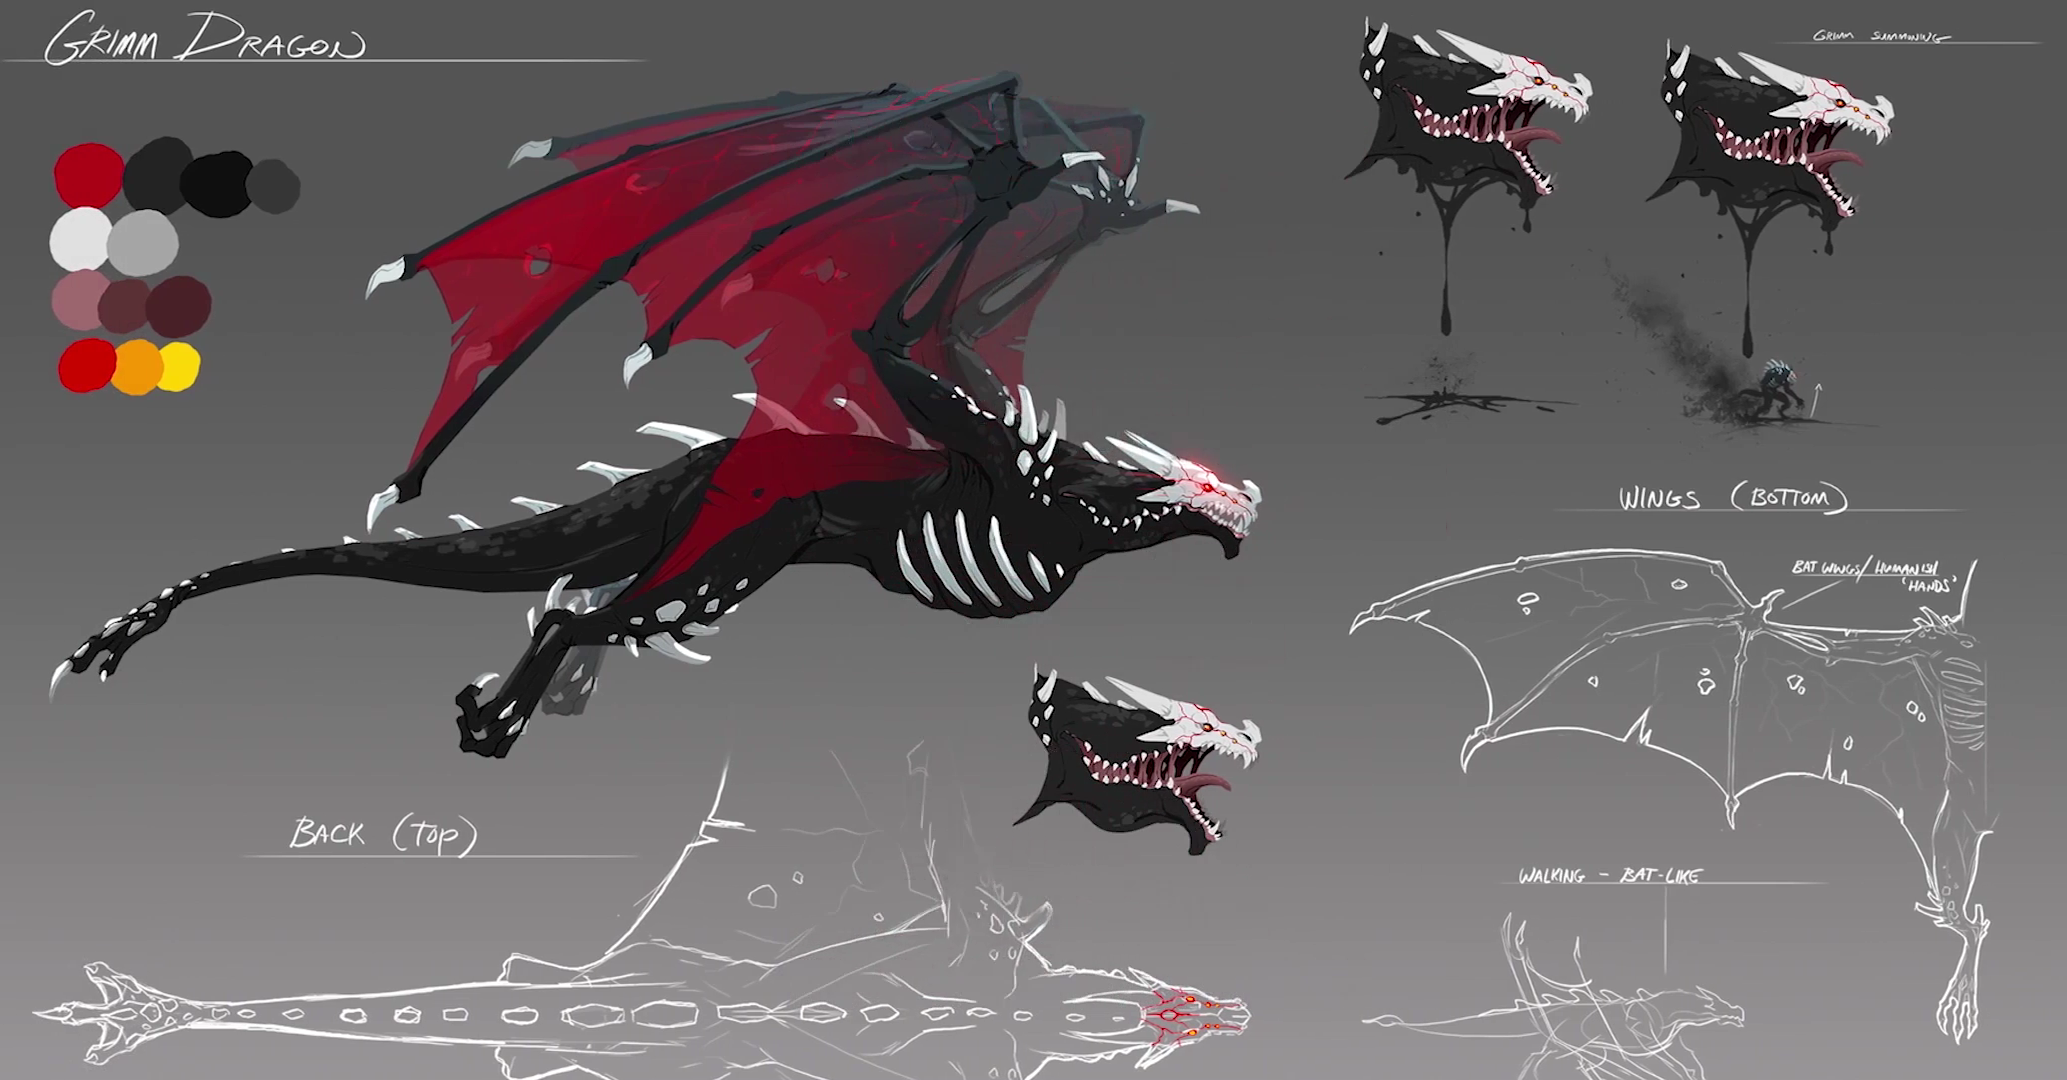 Grimm Dragon Concept Art